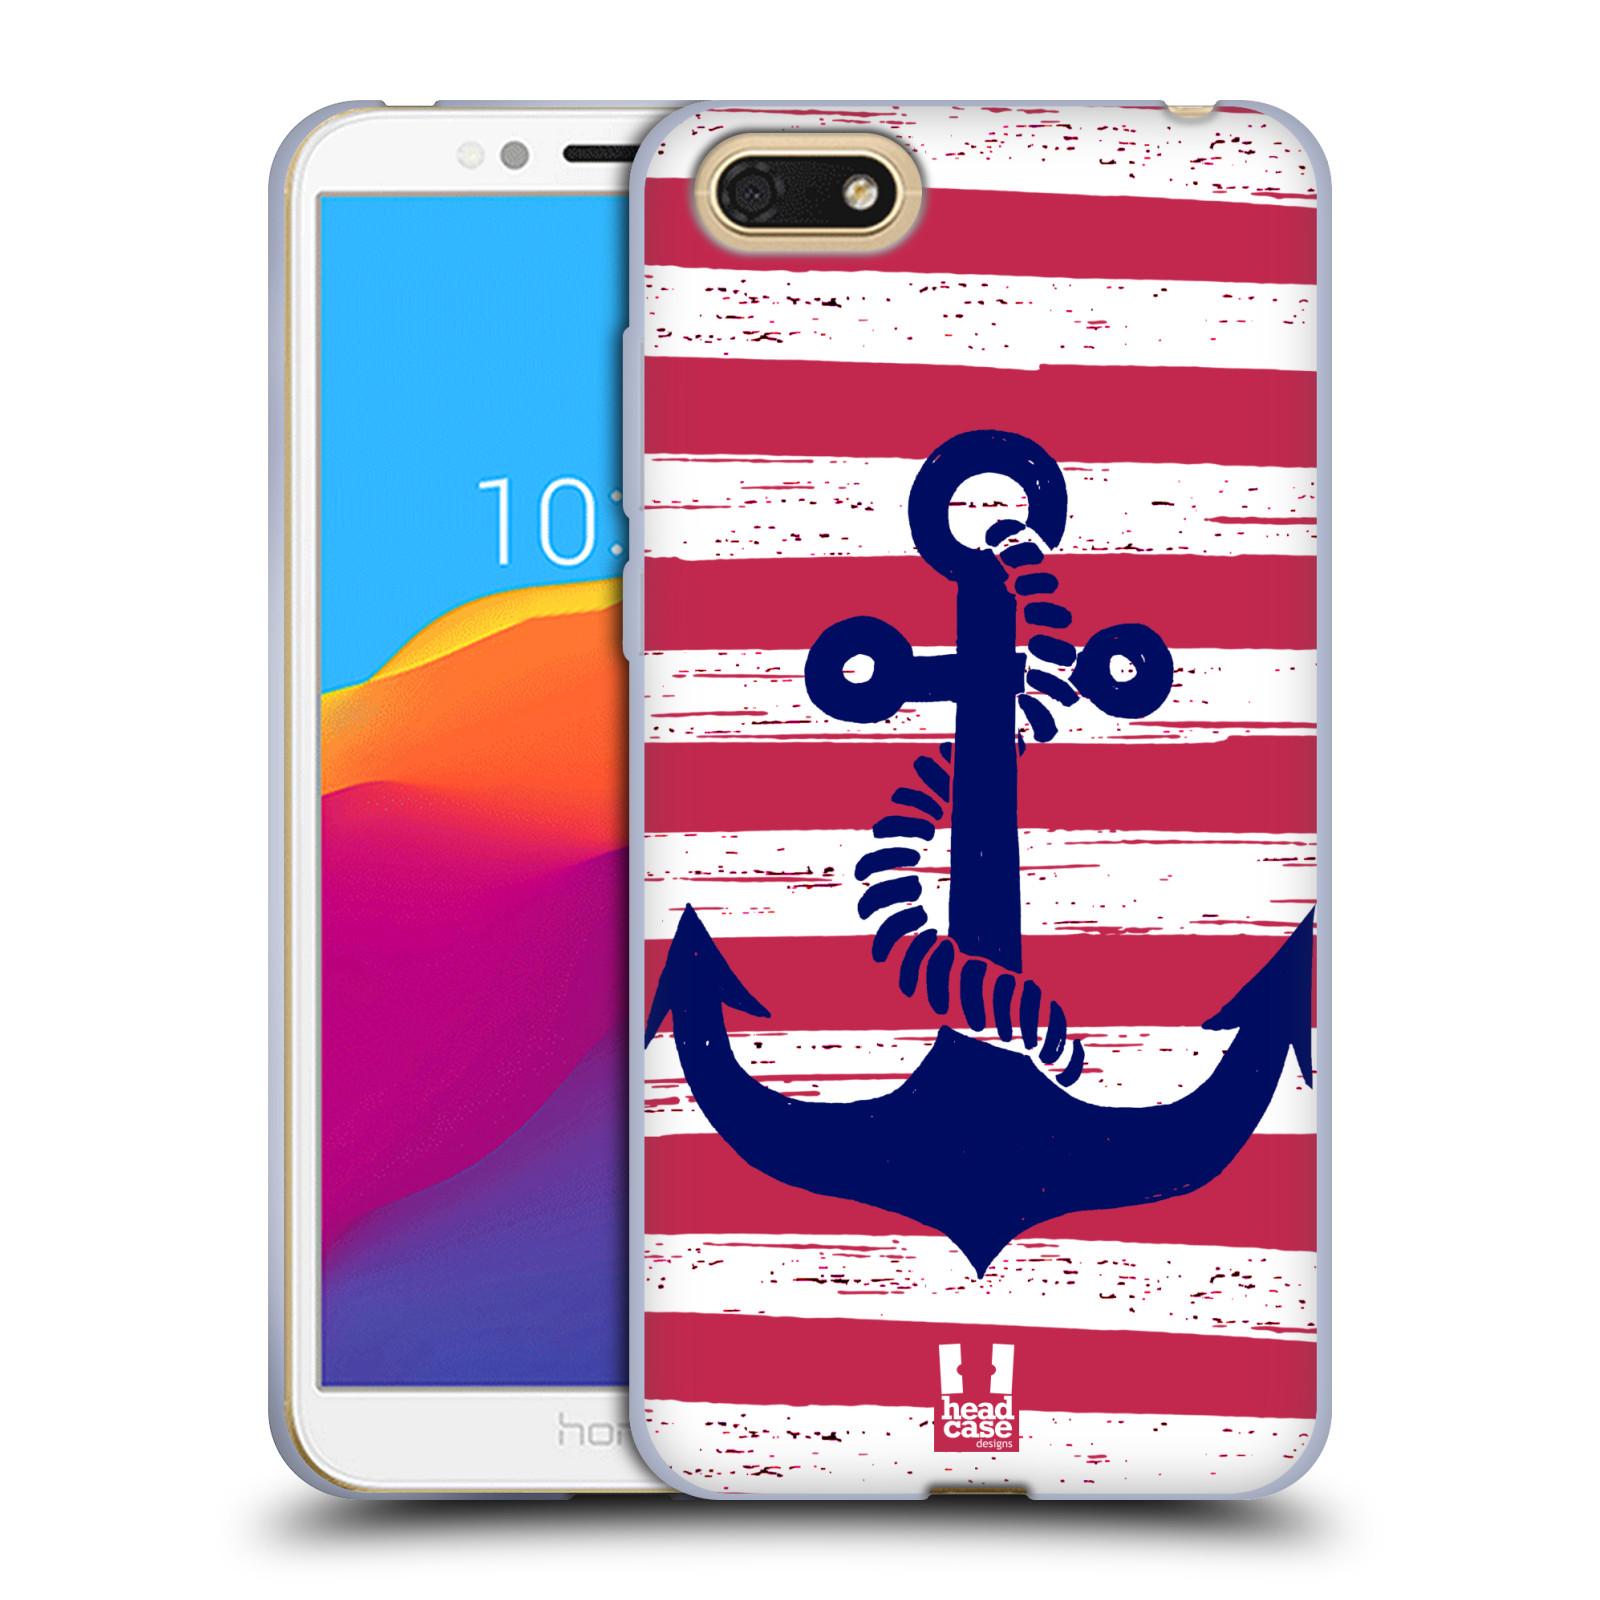 Silikonové pouzdro na mobil Honor 7S - Head Case - KOTVA S PRUHY